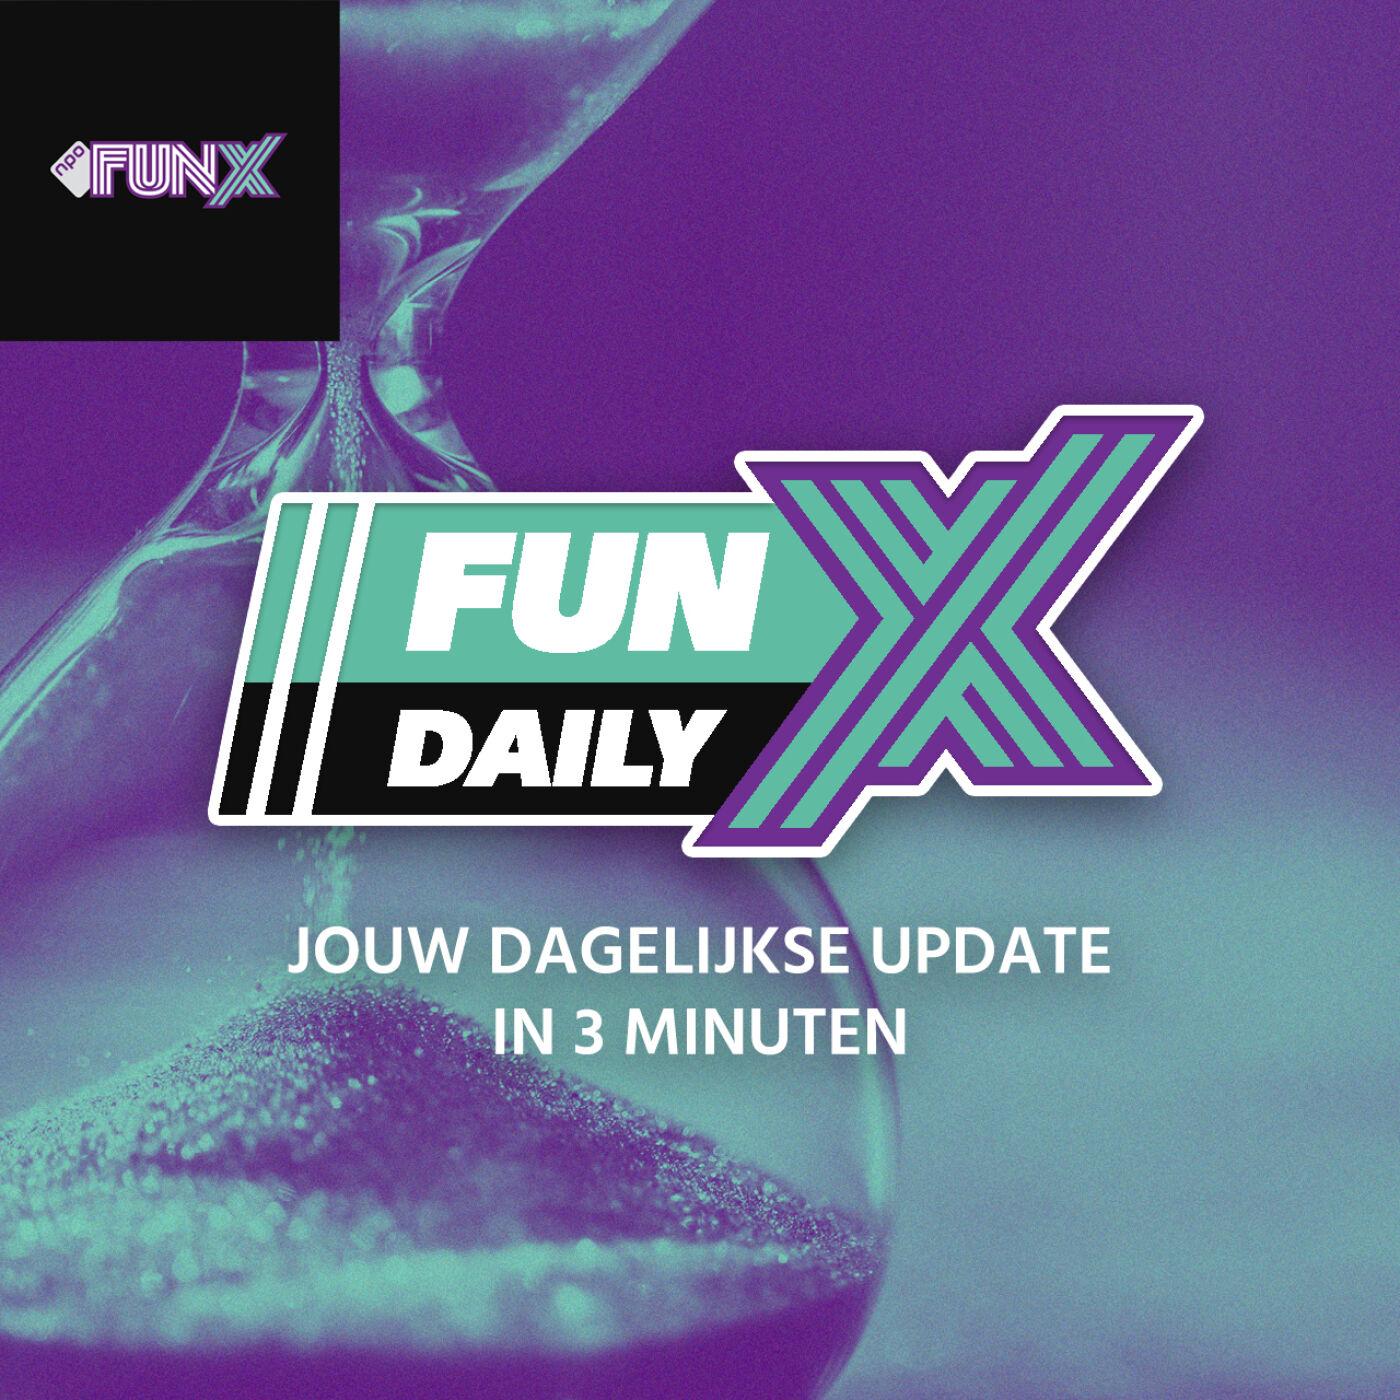 FunX Daily logo